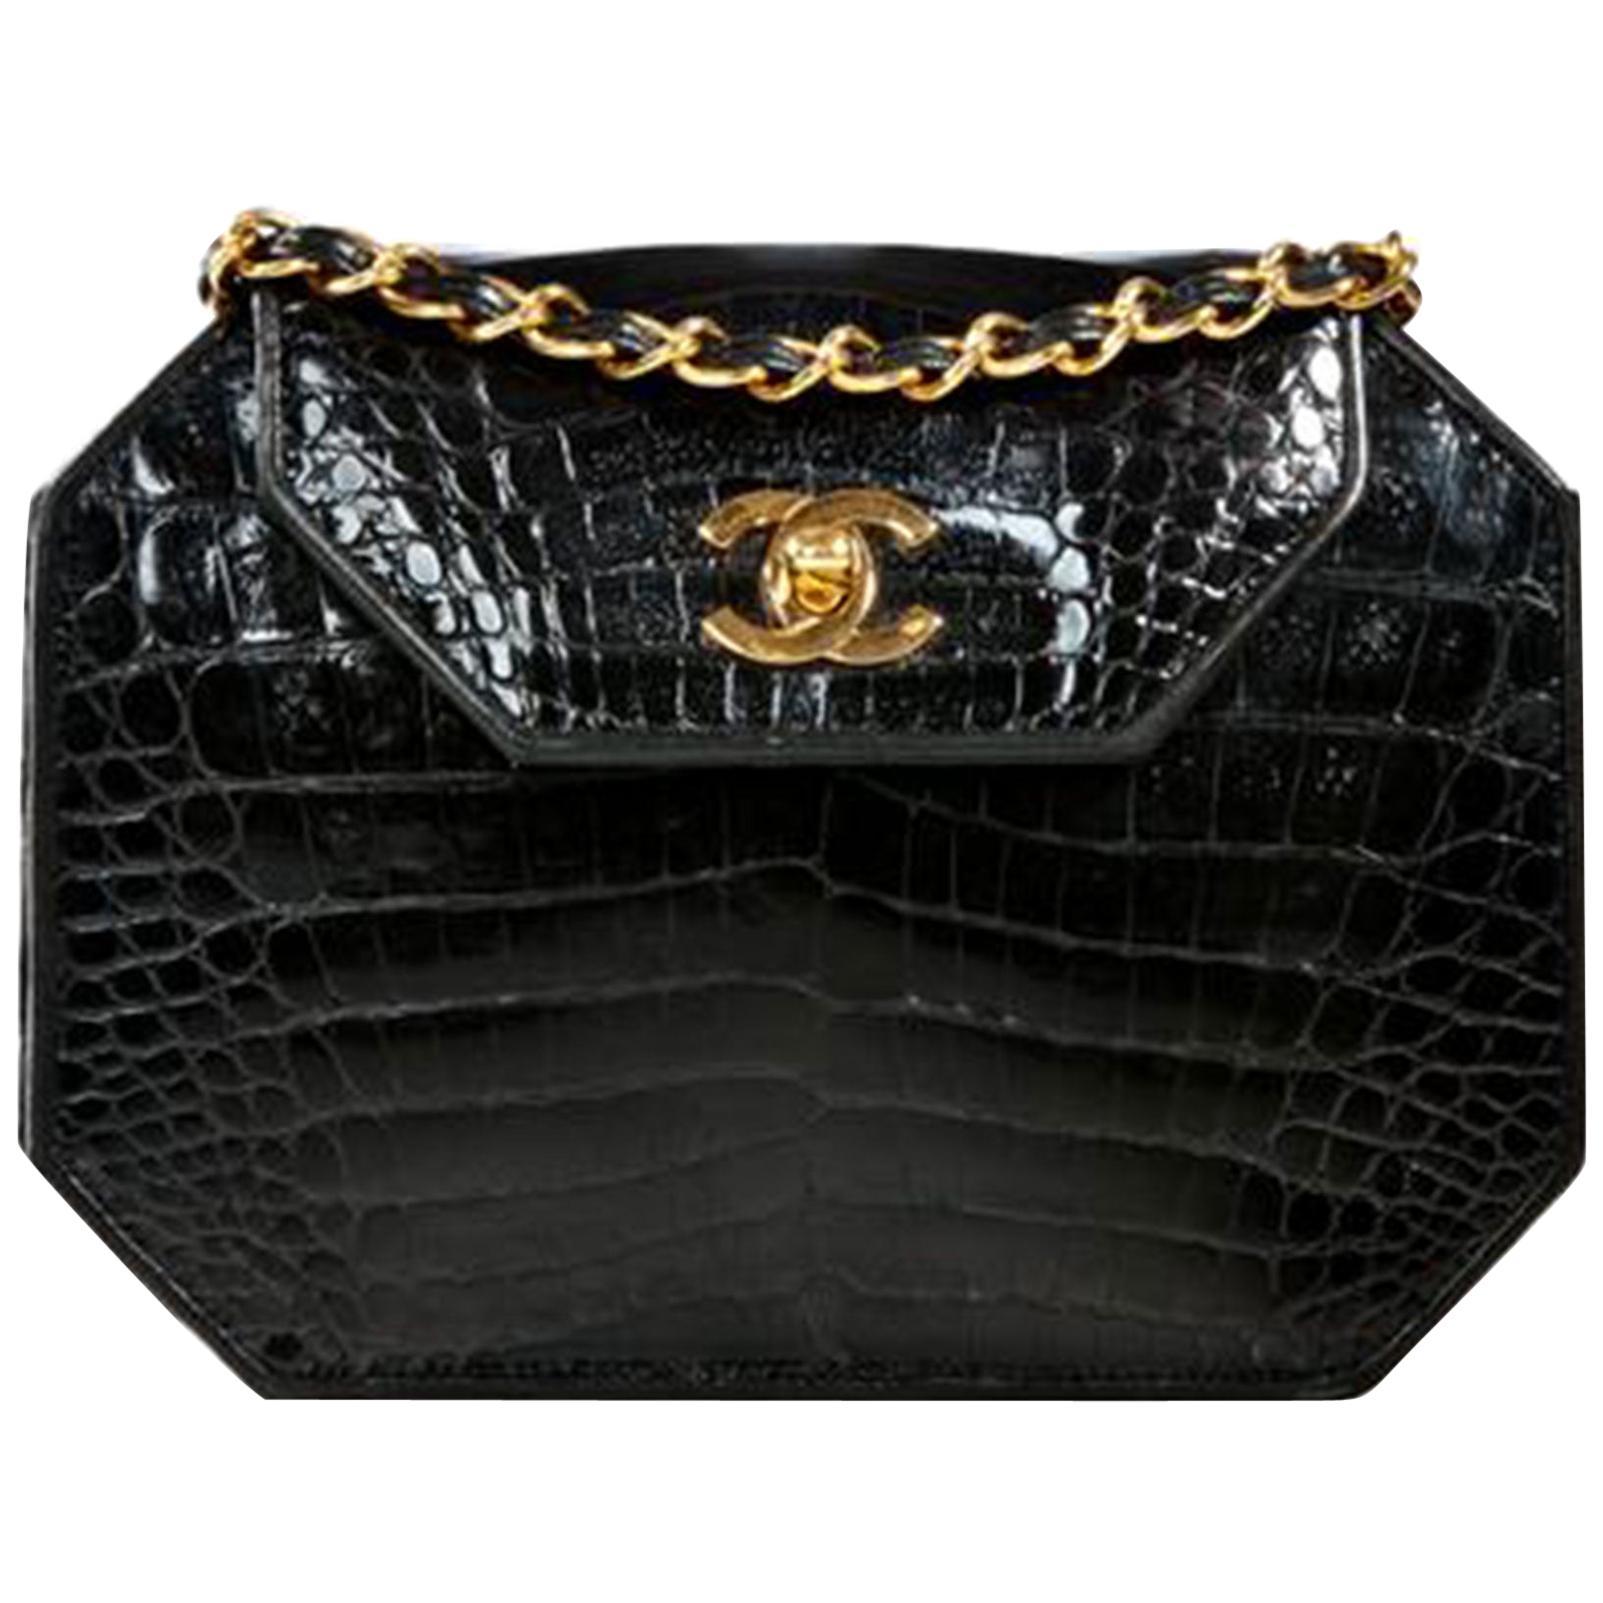 Chanel Classic Flap Clutch Vintage 80's Gold Cc Closure Black Crocodile Skin Bag